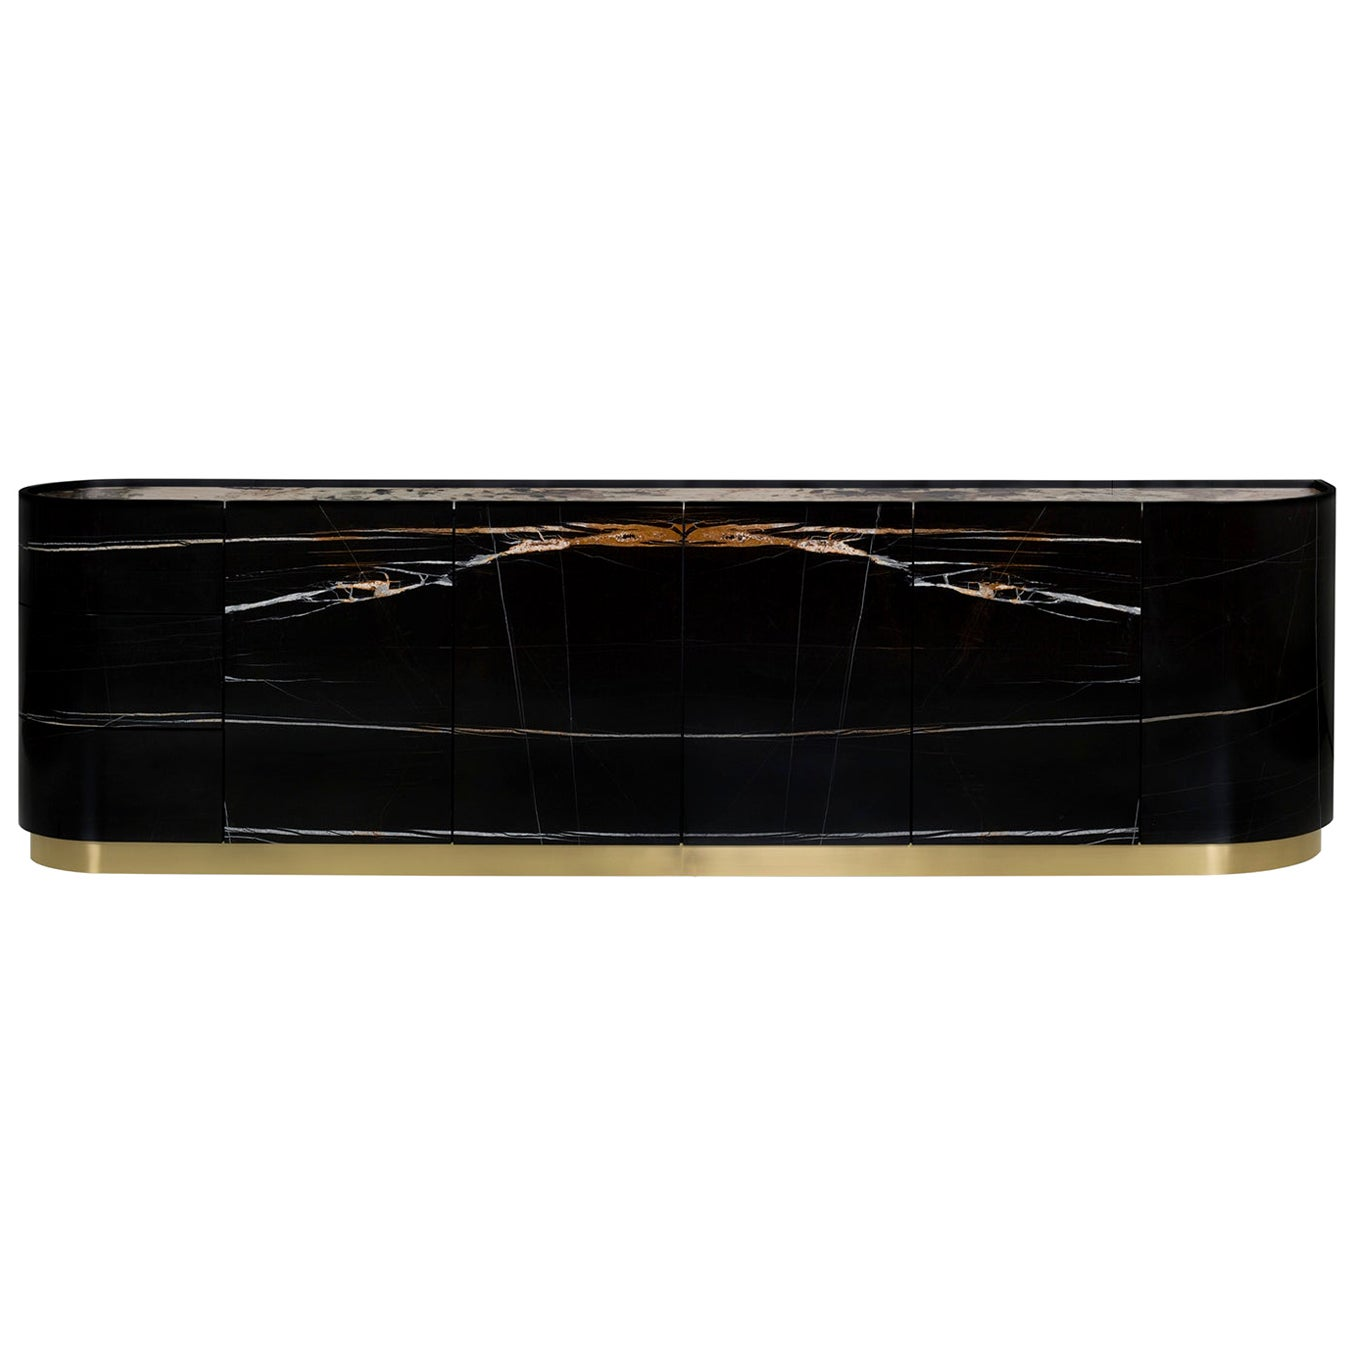 Olival Sideboard Sahara Noir Patagonia Granite Oxidised Brass Black Lacquered